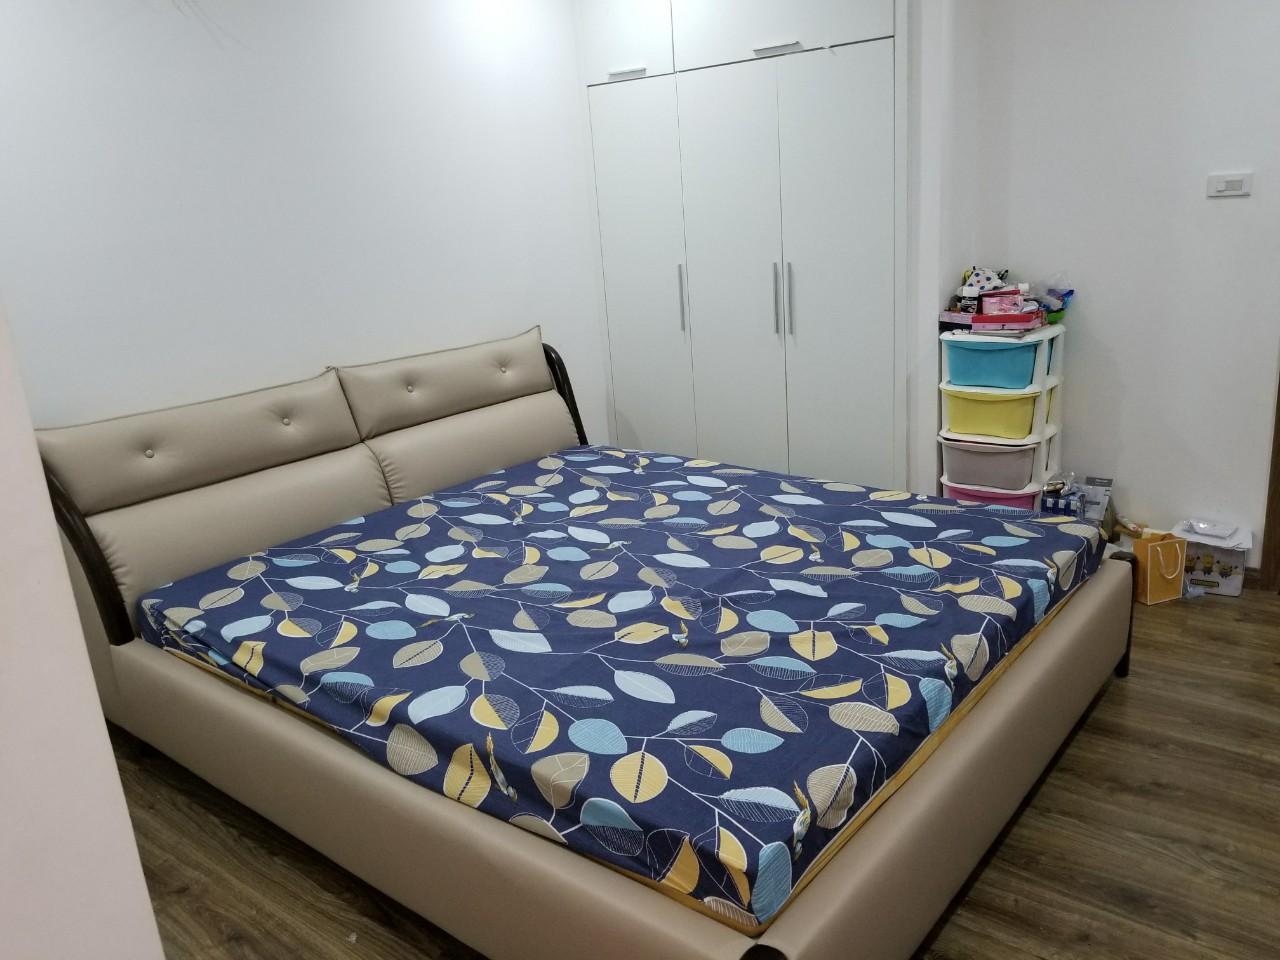 giường bọc nệm da